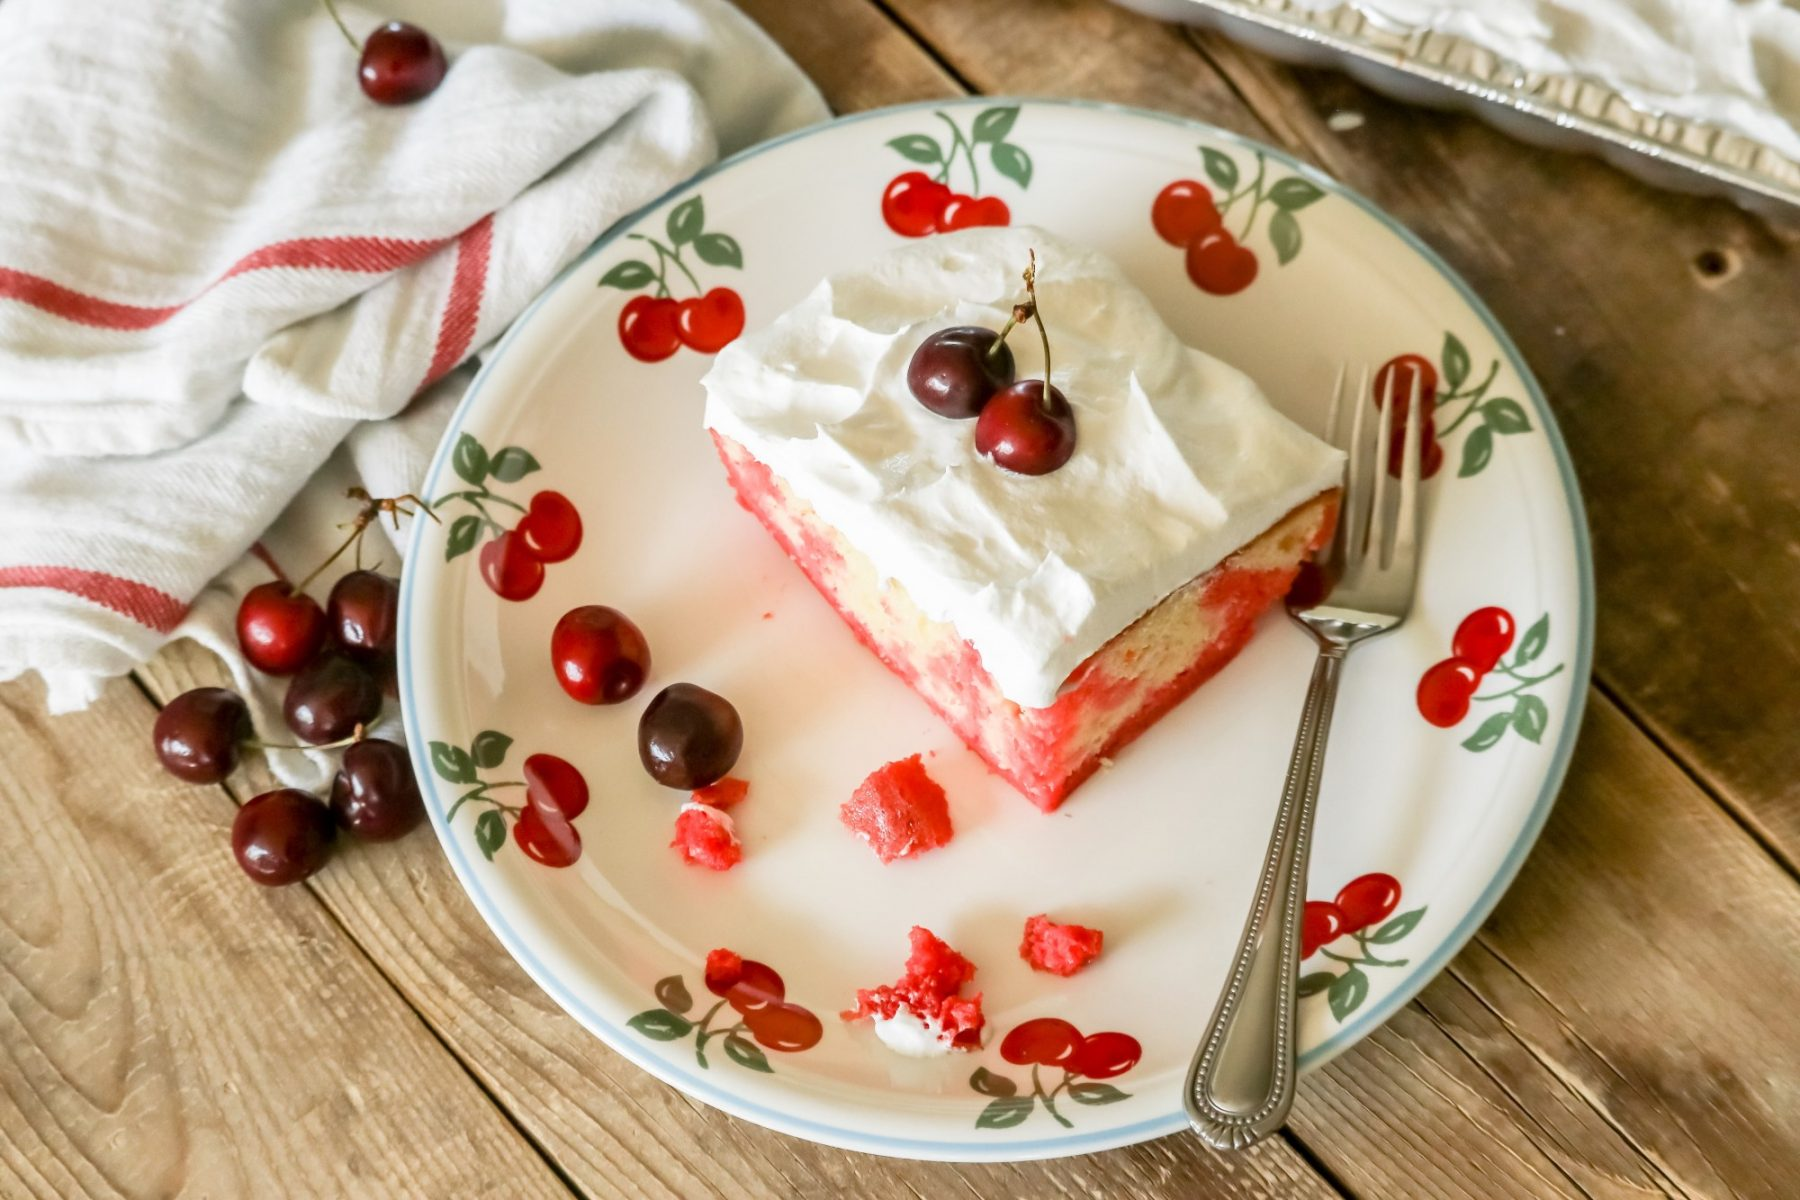 A slice of Cherry Jello Poke Cake on a plate